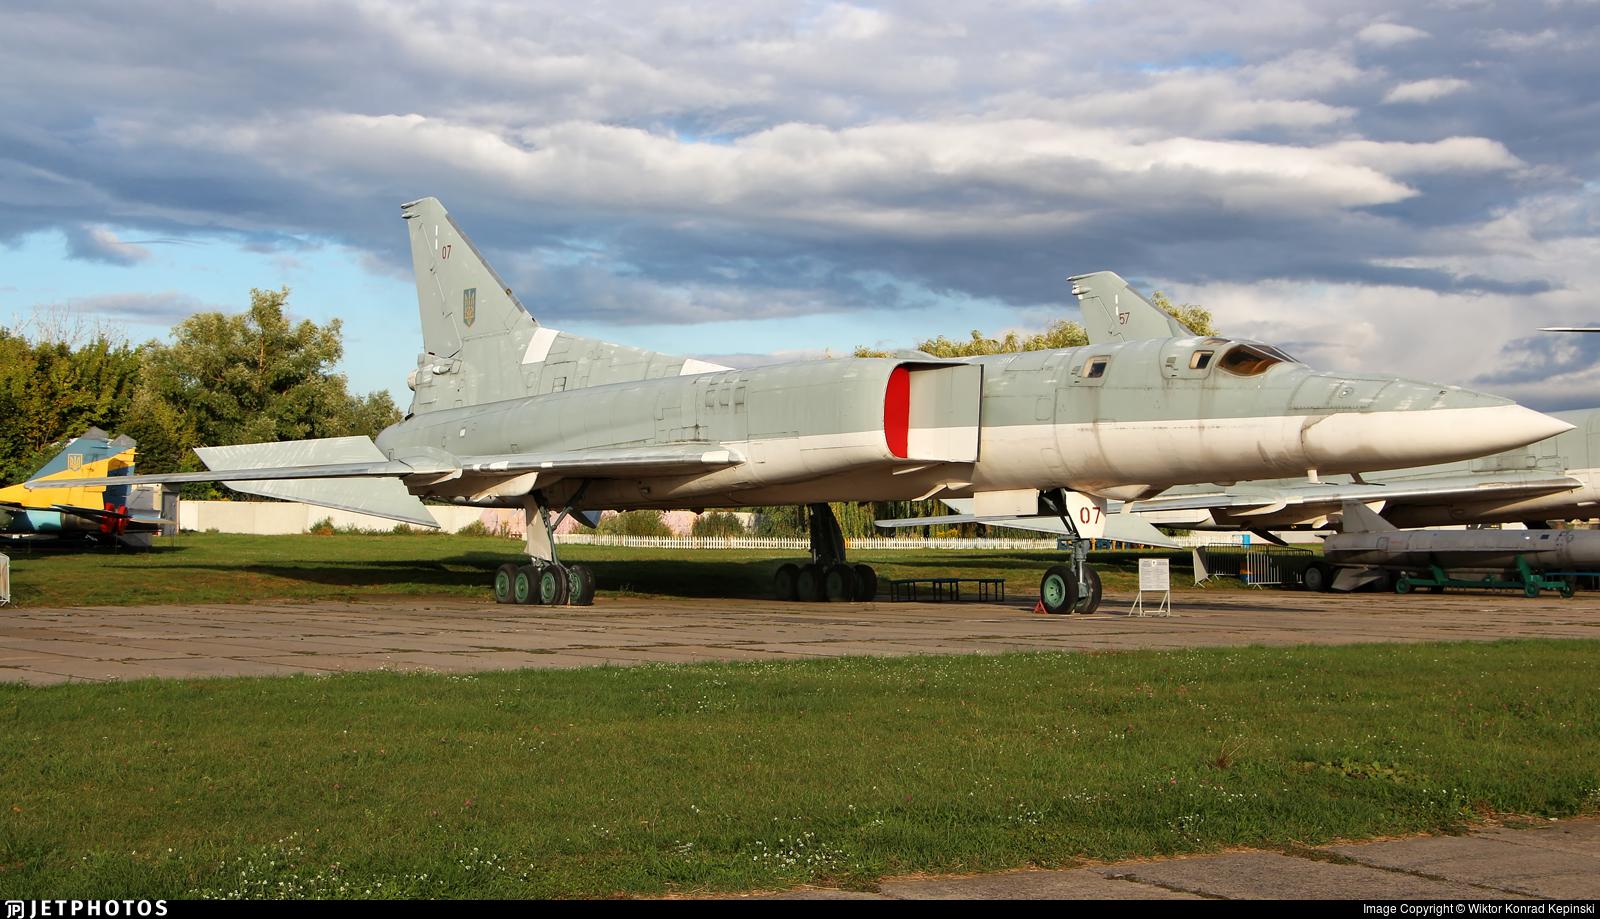 07 - Tupolev Tu-22M3 Backfire - Ukraine - Air Force